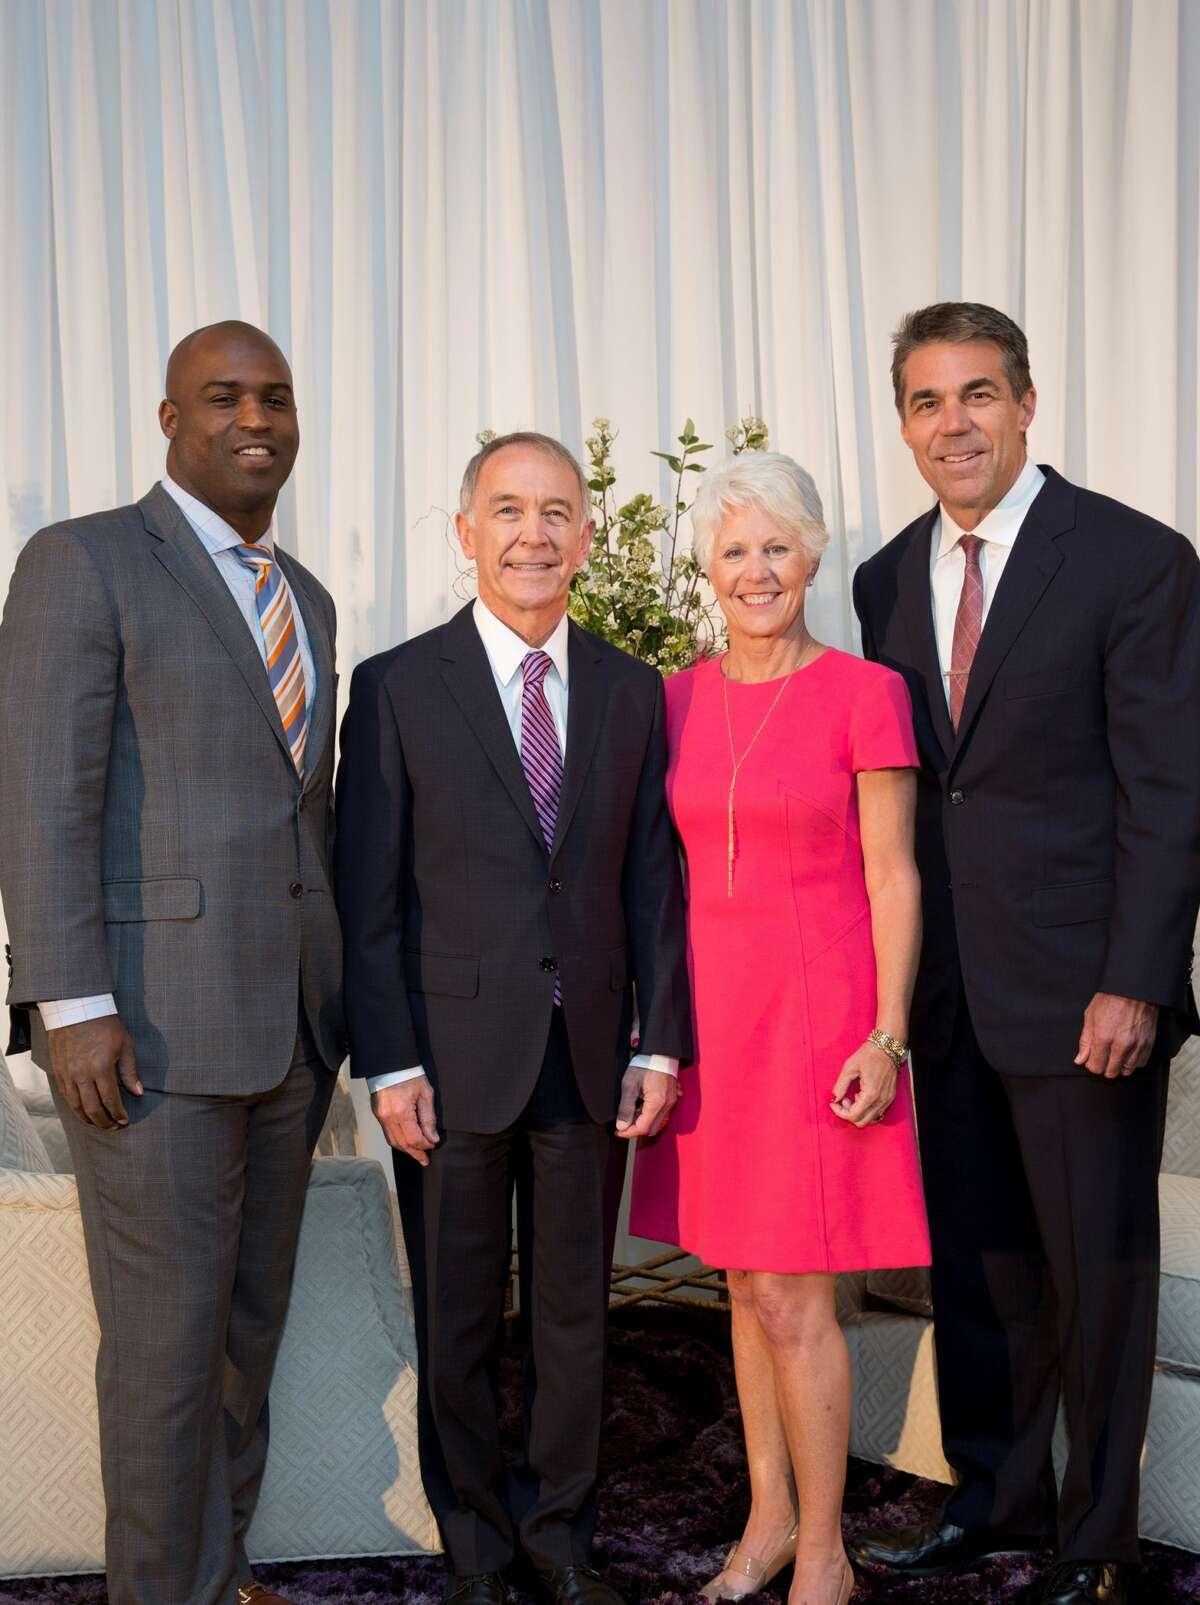 Ricky Williams, Dr. C. Edward Coffey (Menninger President & CEO), Kathy Coffey, Chris Fowler